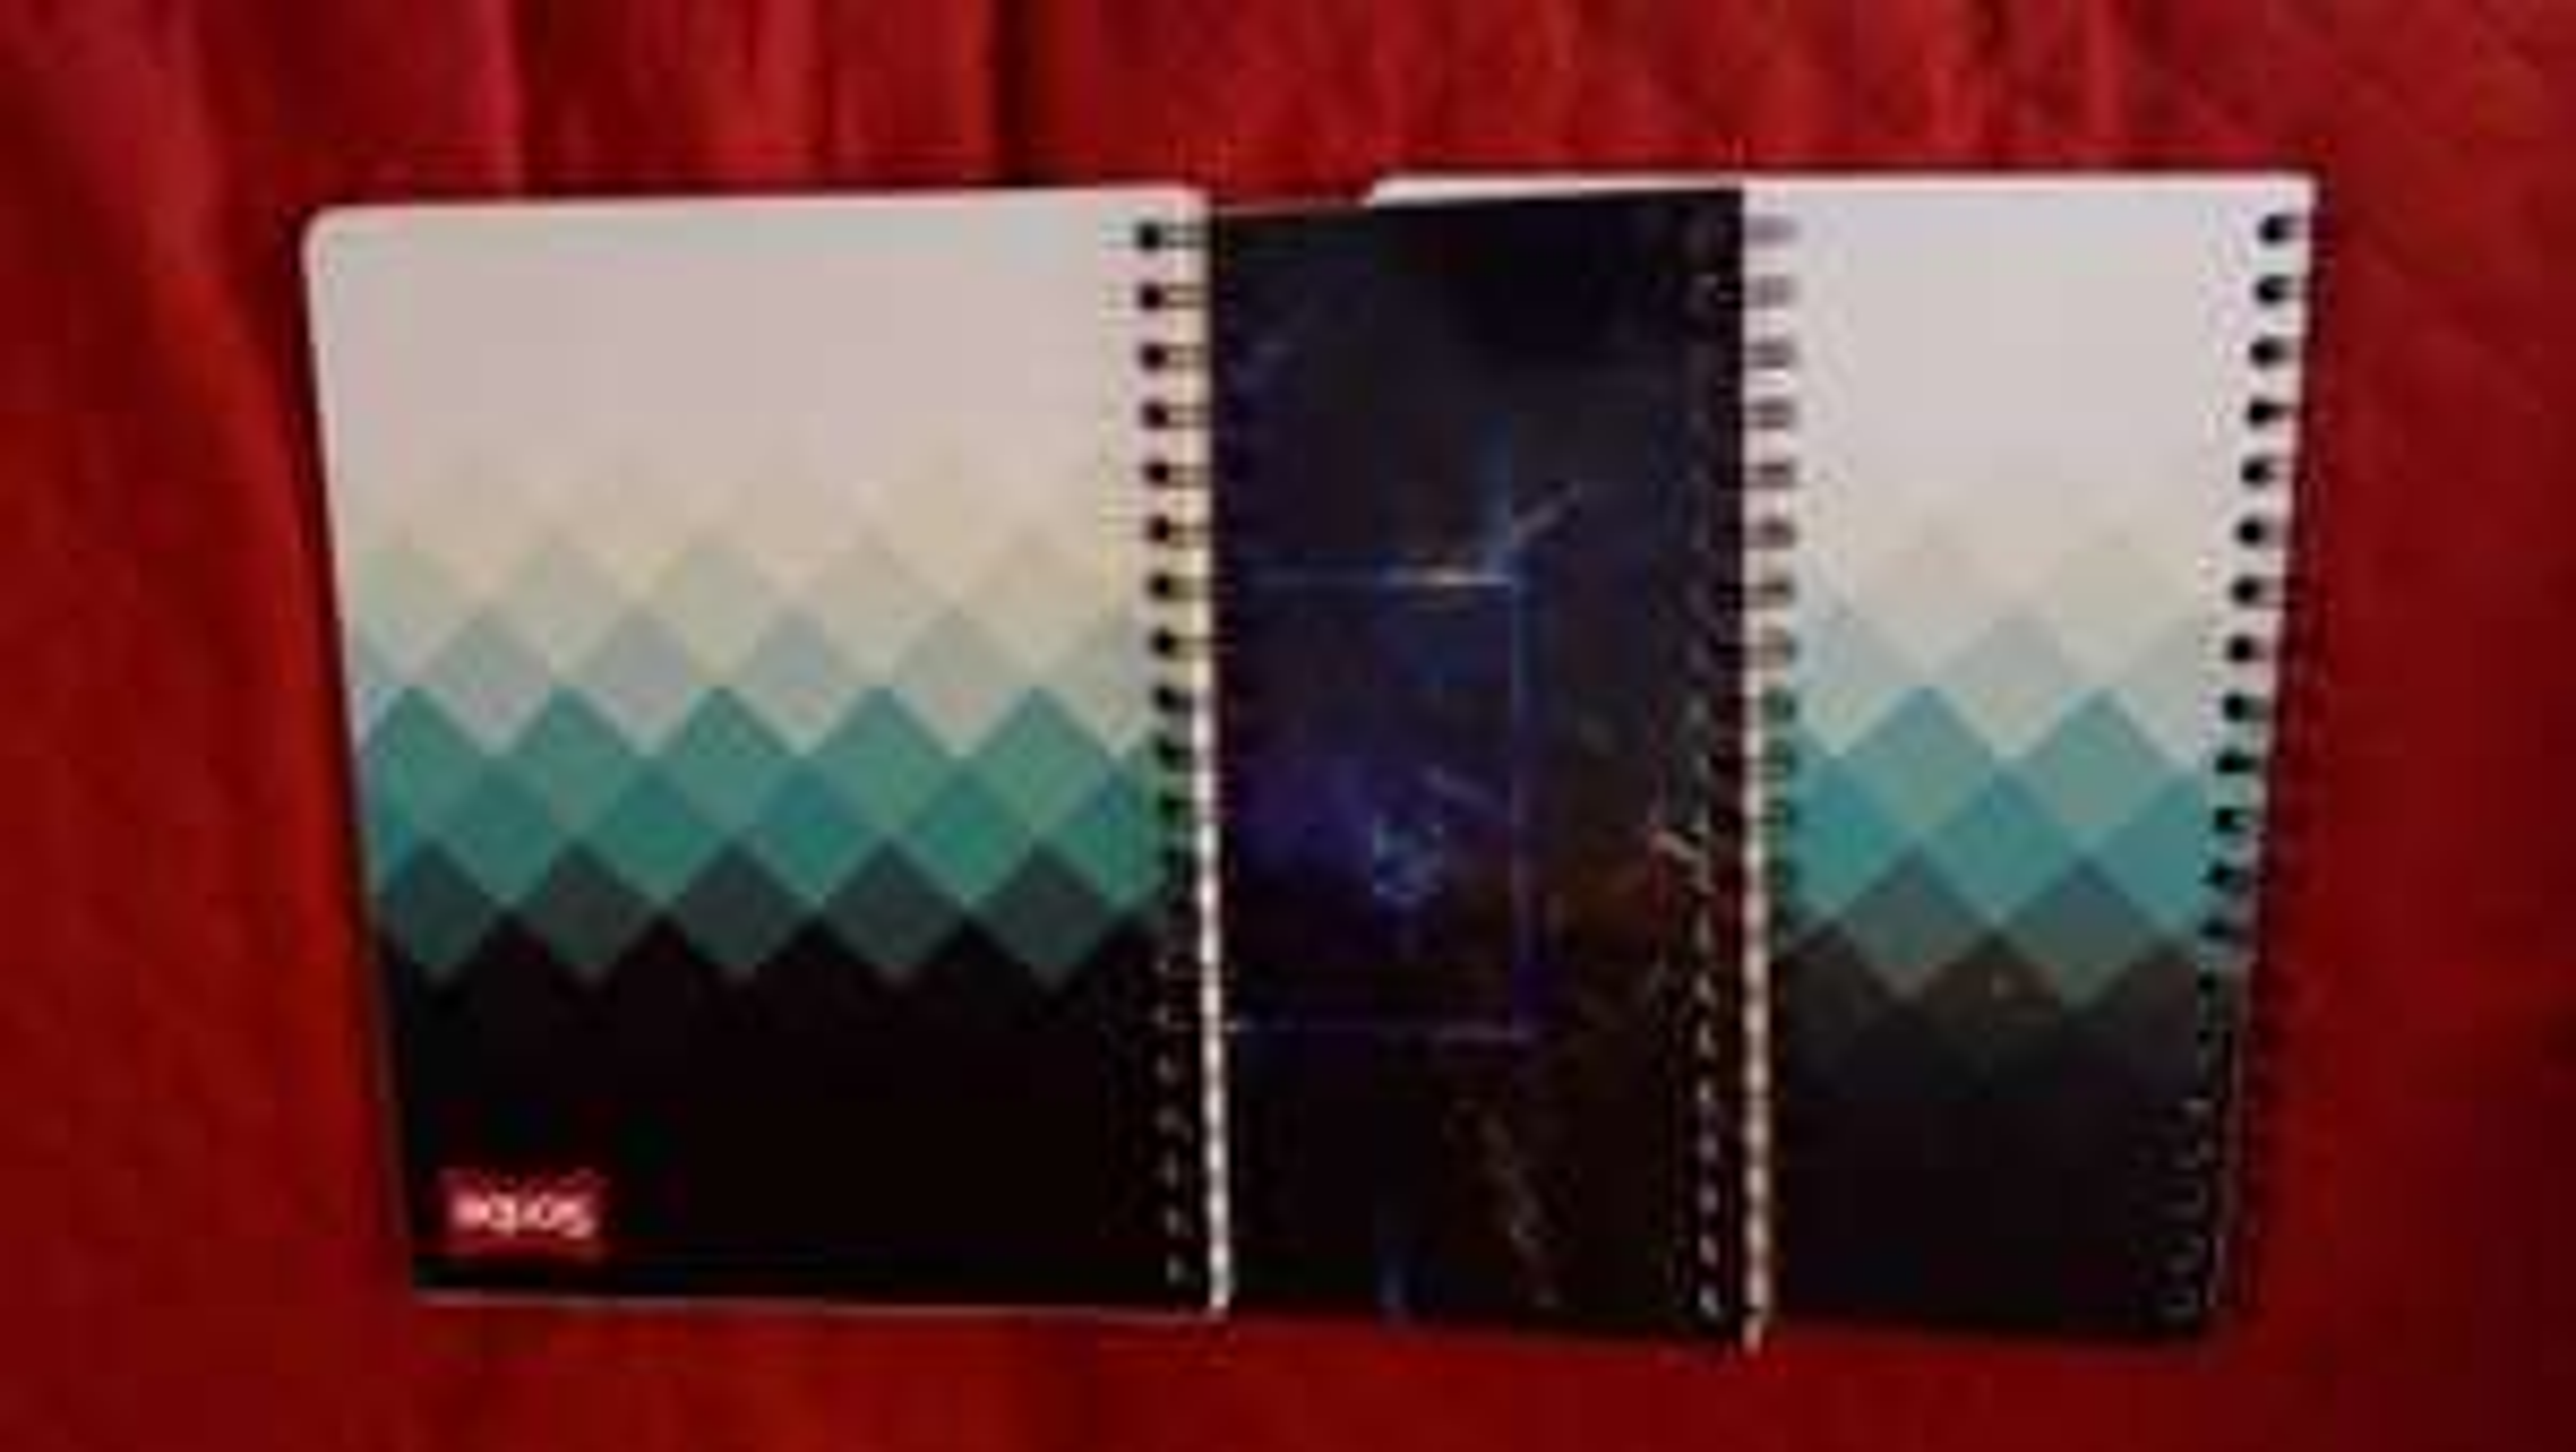 Bodega Aurrerá: Cuadernos scribe de pasta dura $5.03